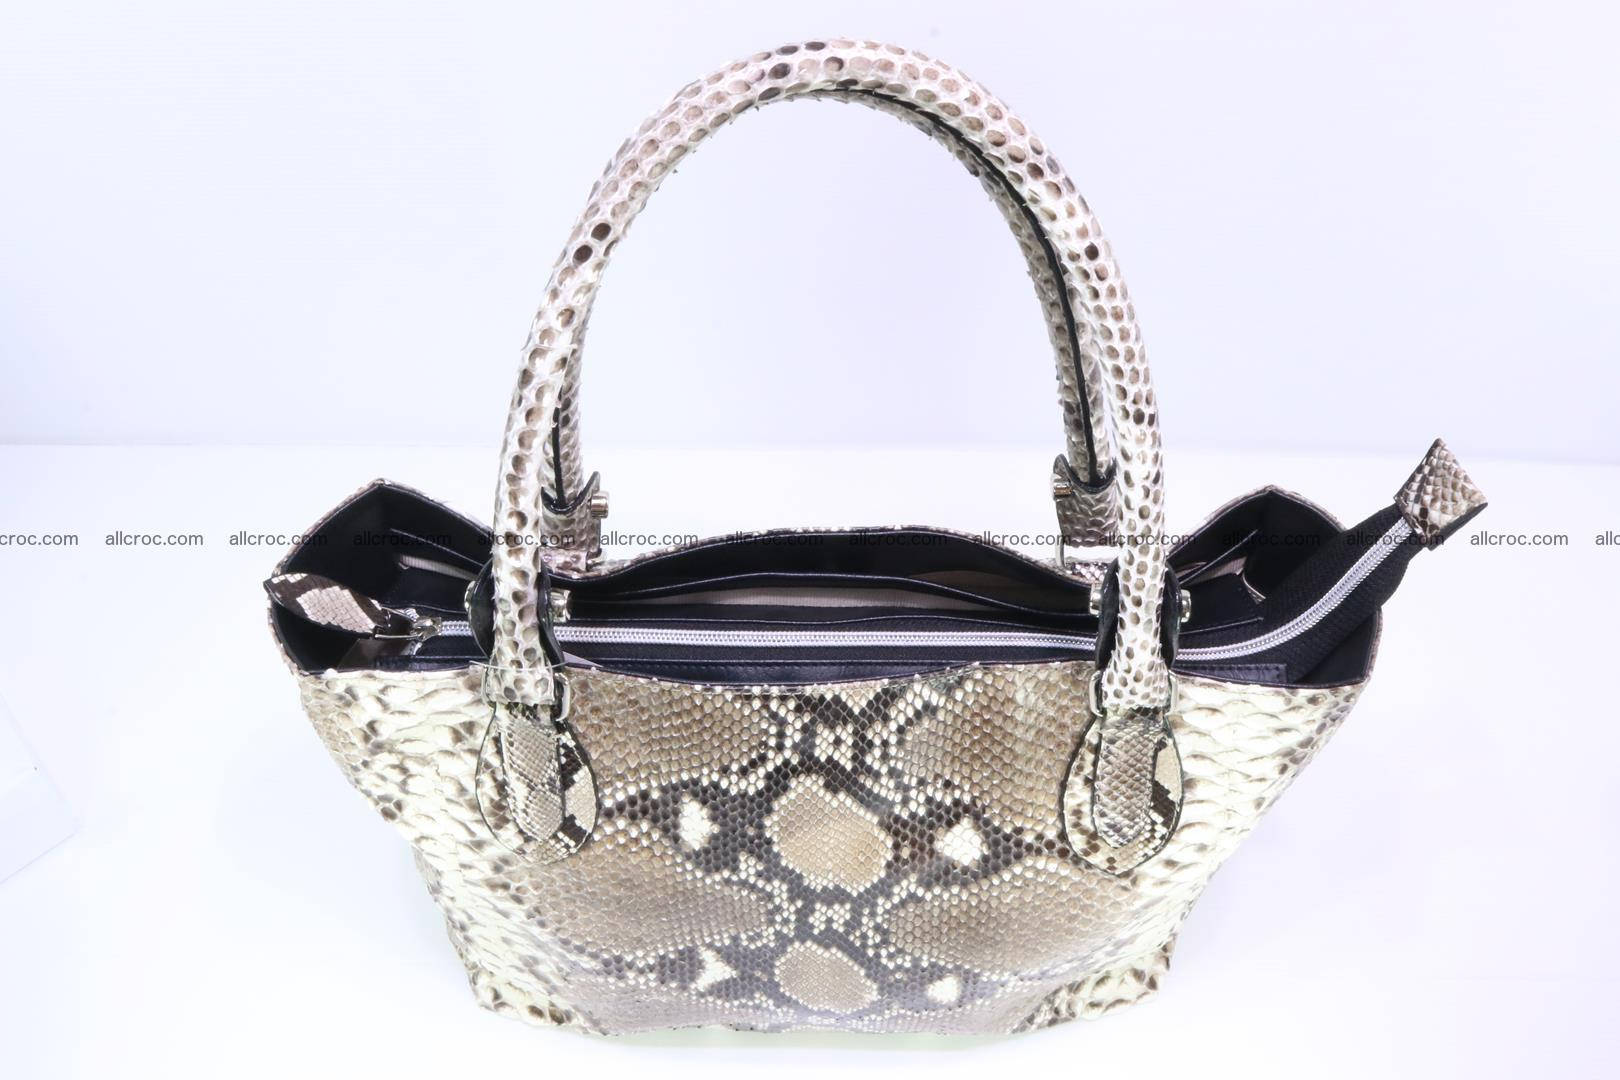 Python skin handbag for lady from genuine Python skin 206 Foto 4